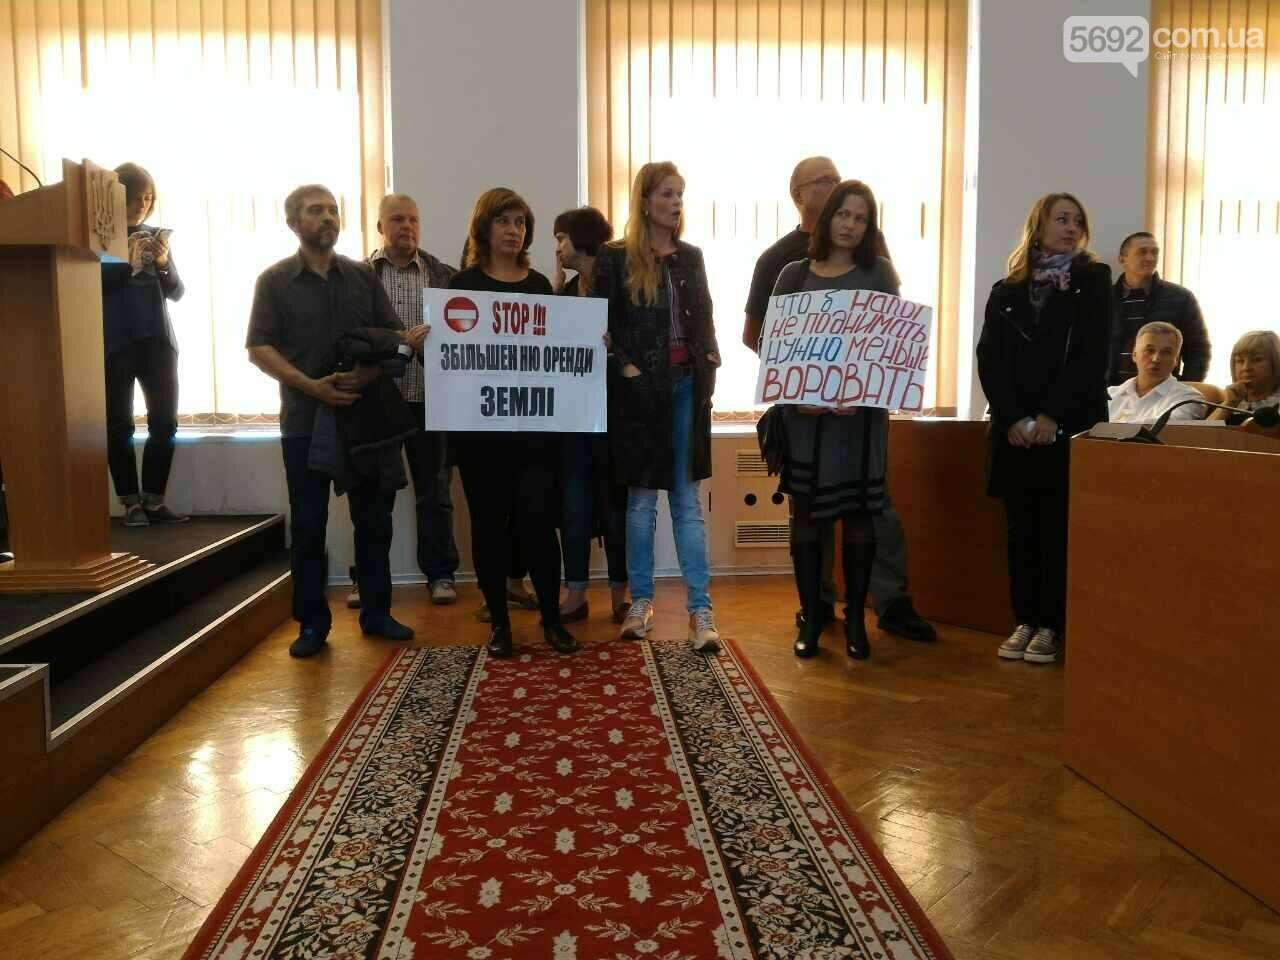 Предприниматели Каменского протестуют против повышения налога на землю, фото-1